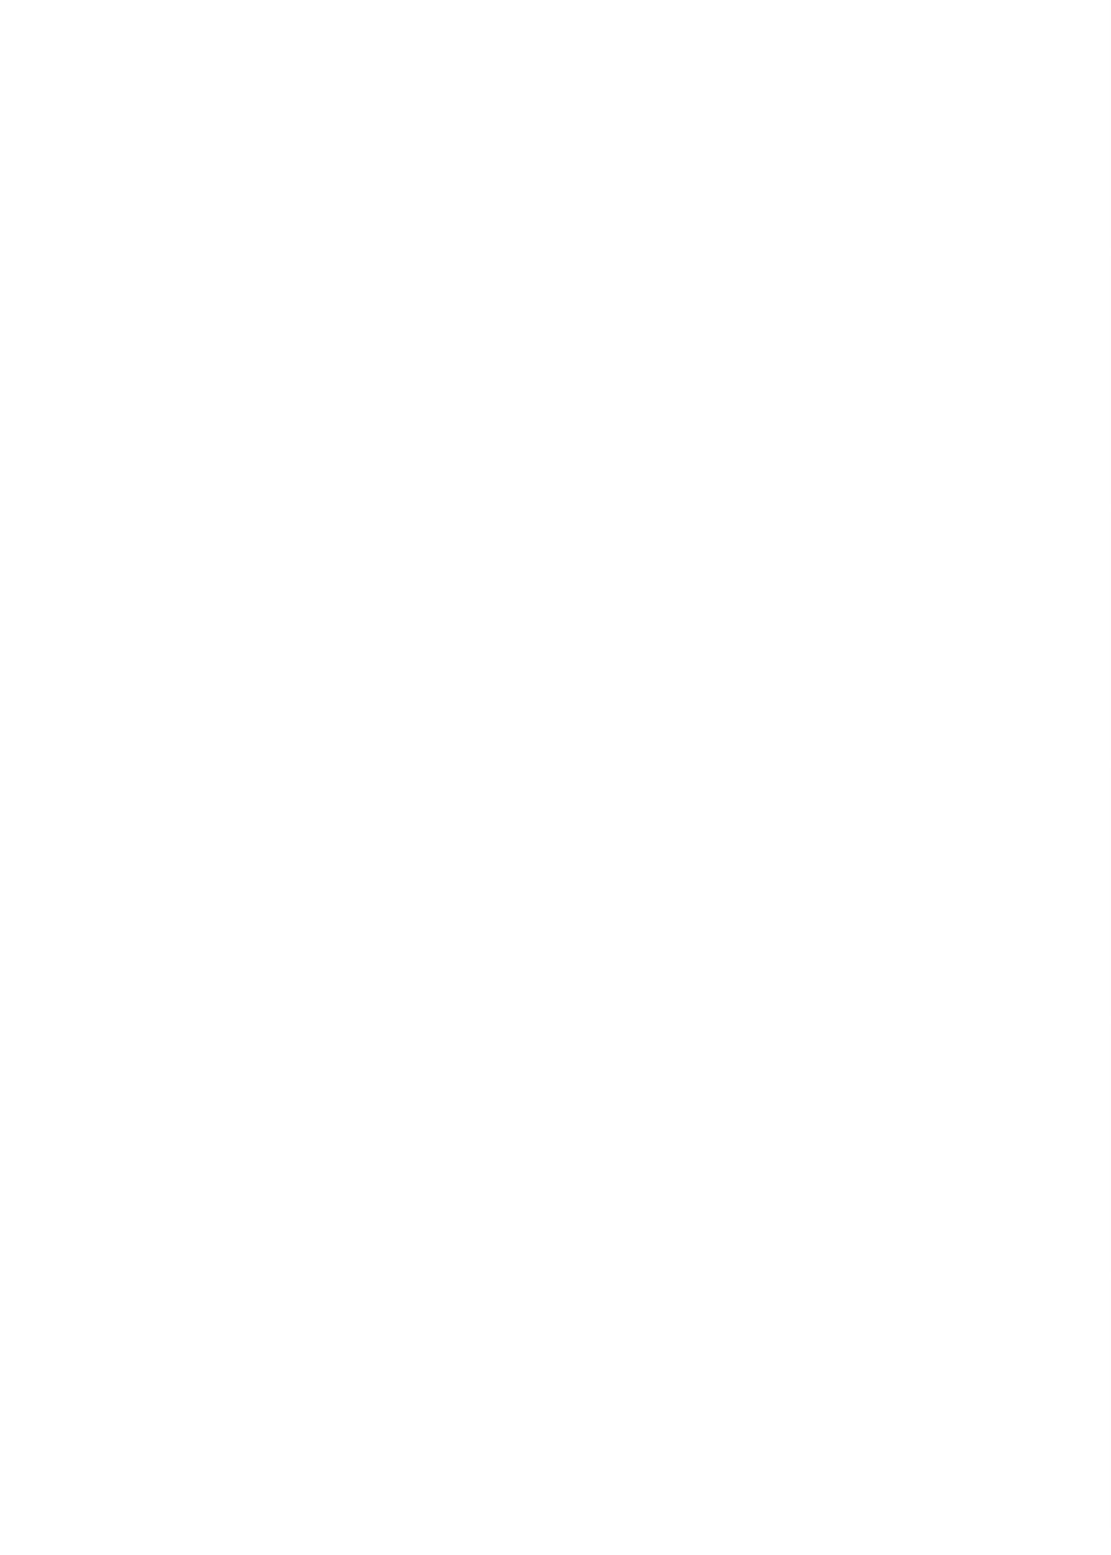 [Cheese Company (Peso)] Gag Jikuu no Onee-chan to Ero Doujin no Onee-chan to 11-ten no Onee-chan to Sex Suru Hon (Touhou Project) [English] [arkngthand] [Digital] 2